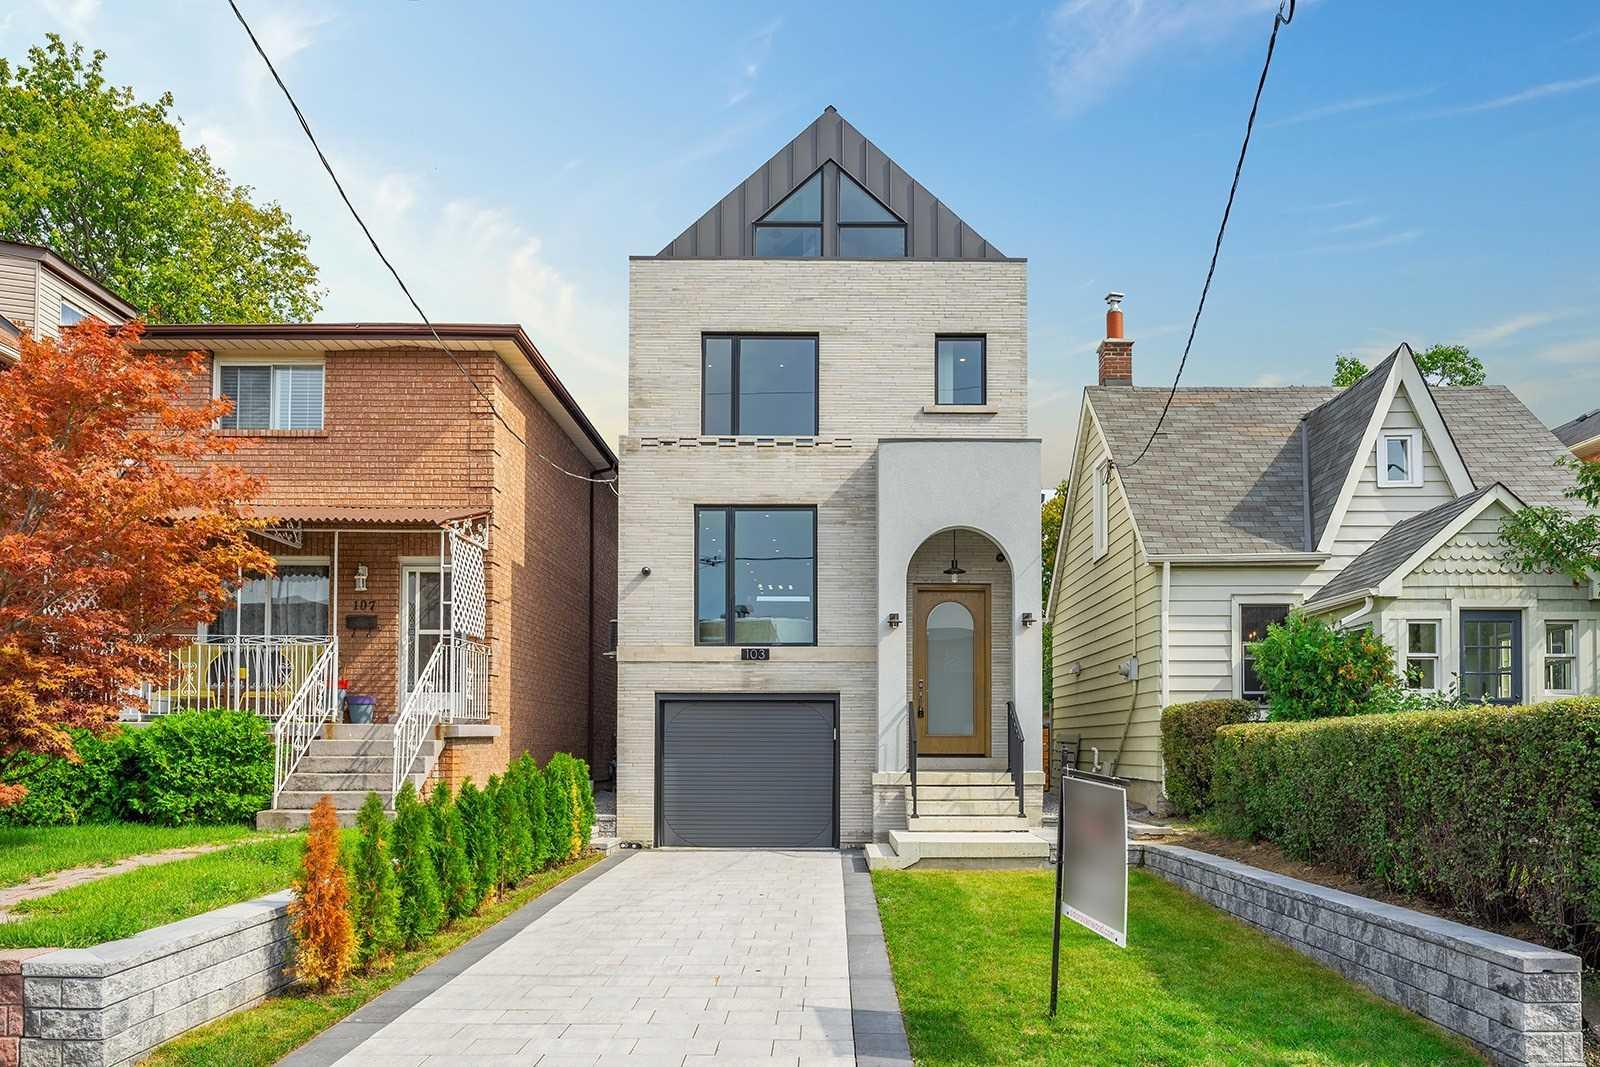 103 Priscilla Ave, Toronto, Ontario M6S3W4, 4 Bedrooms Bedrooms, 8 Rooms Rooms,6 BathroomsBathrooms,Detached,For Sale,Priscilla,W5395358